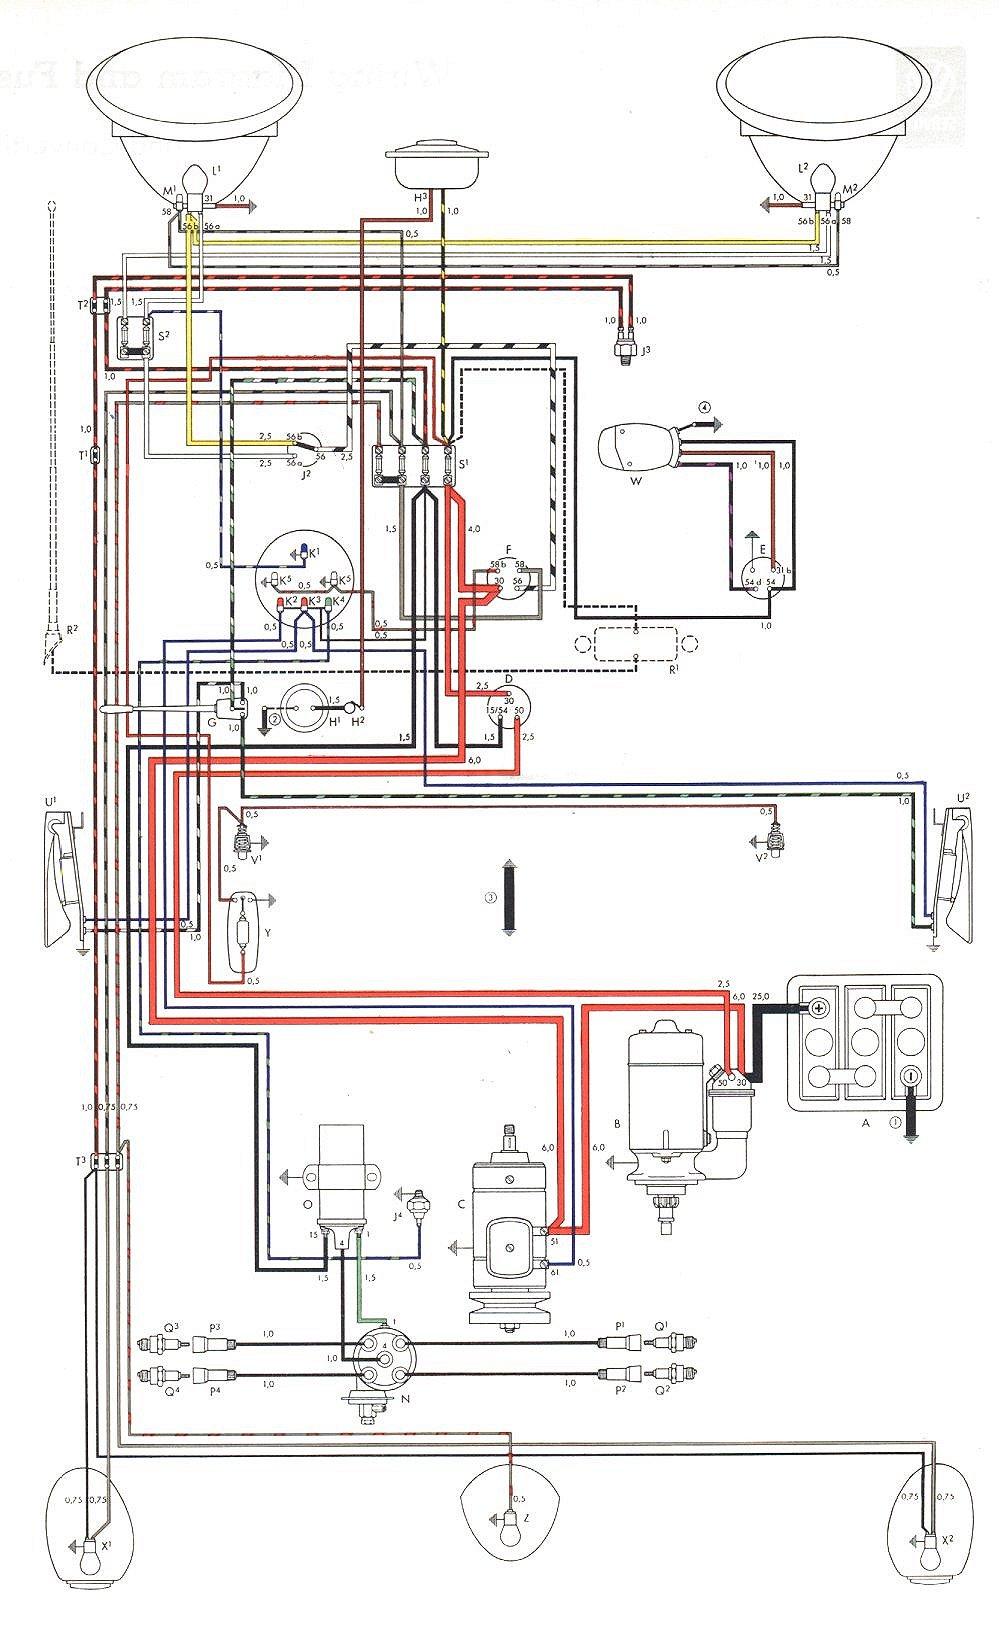 23a 12v Battery At Walgreens Kirkland 6 Volt Golf Cart 259790 Wiring Diagram